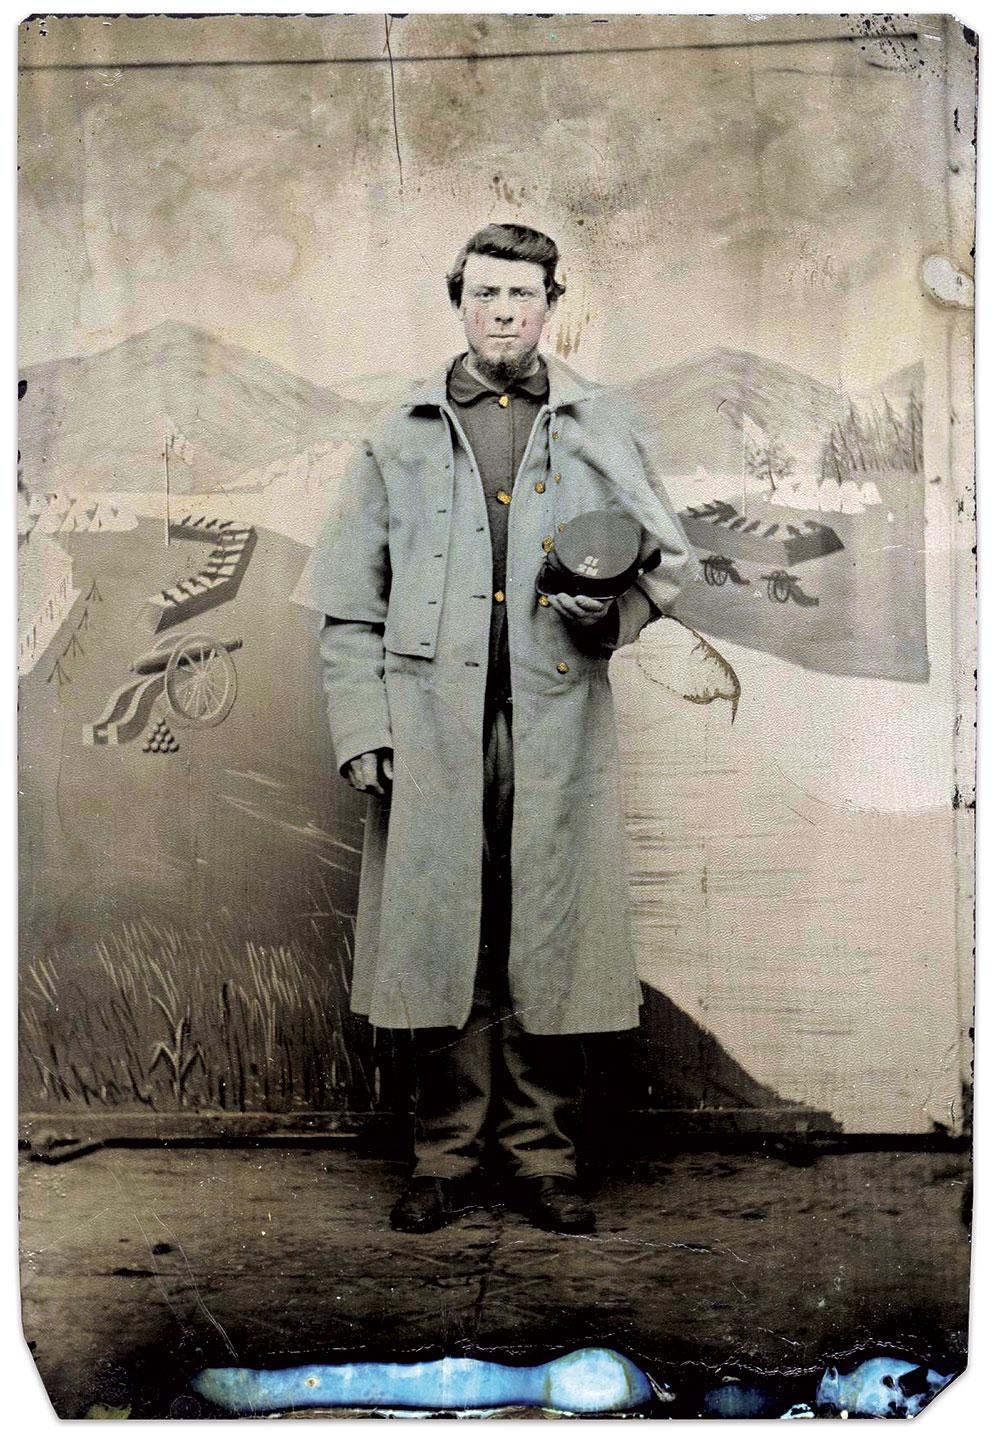 Quarter-plate tintype. John Robella Collection.